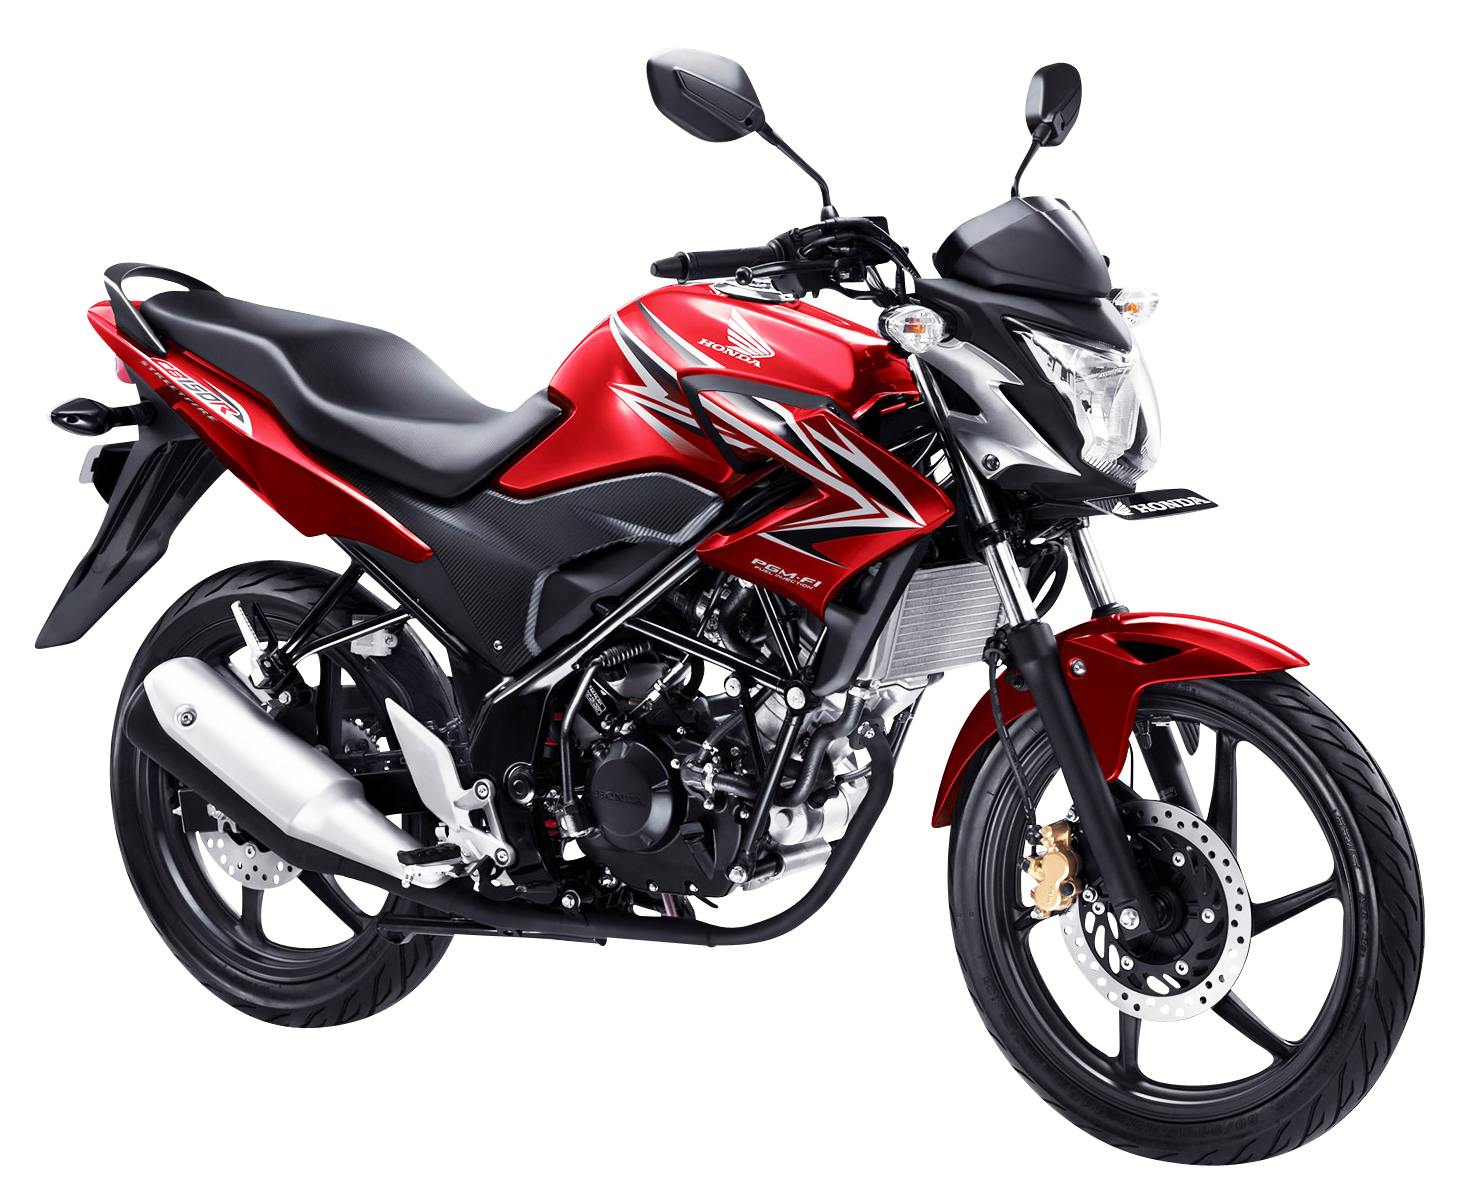 Honda CB150R Streetfire PNG Image